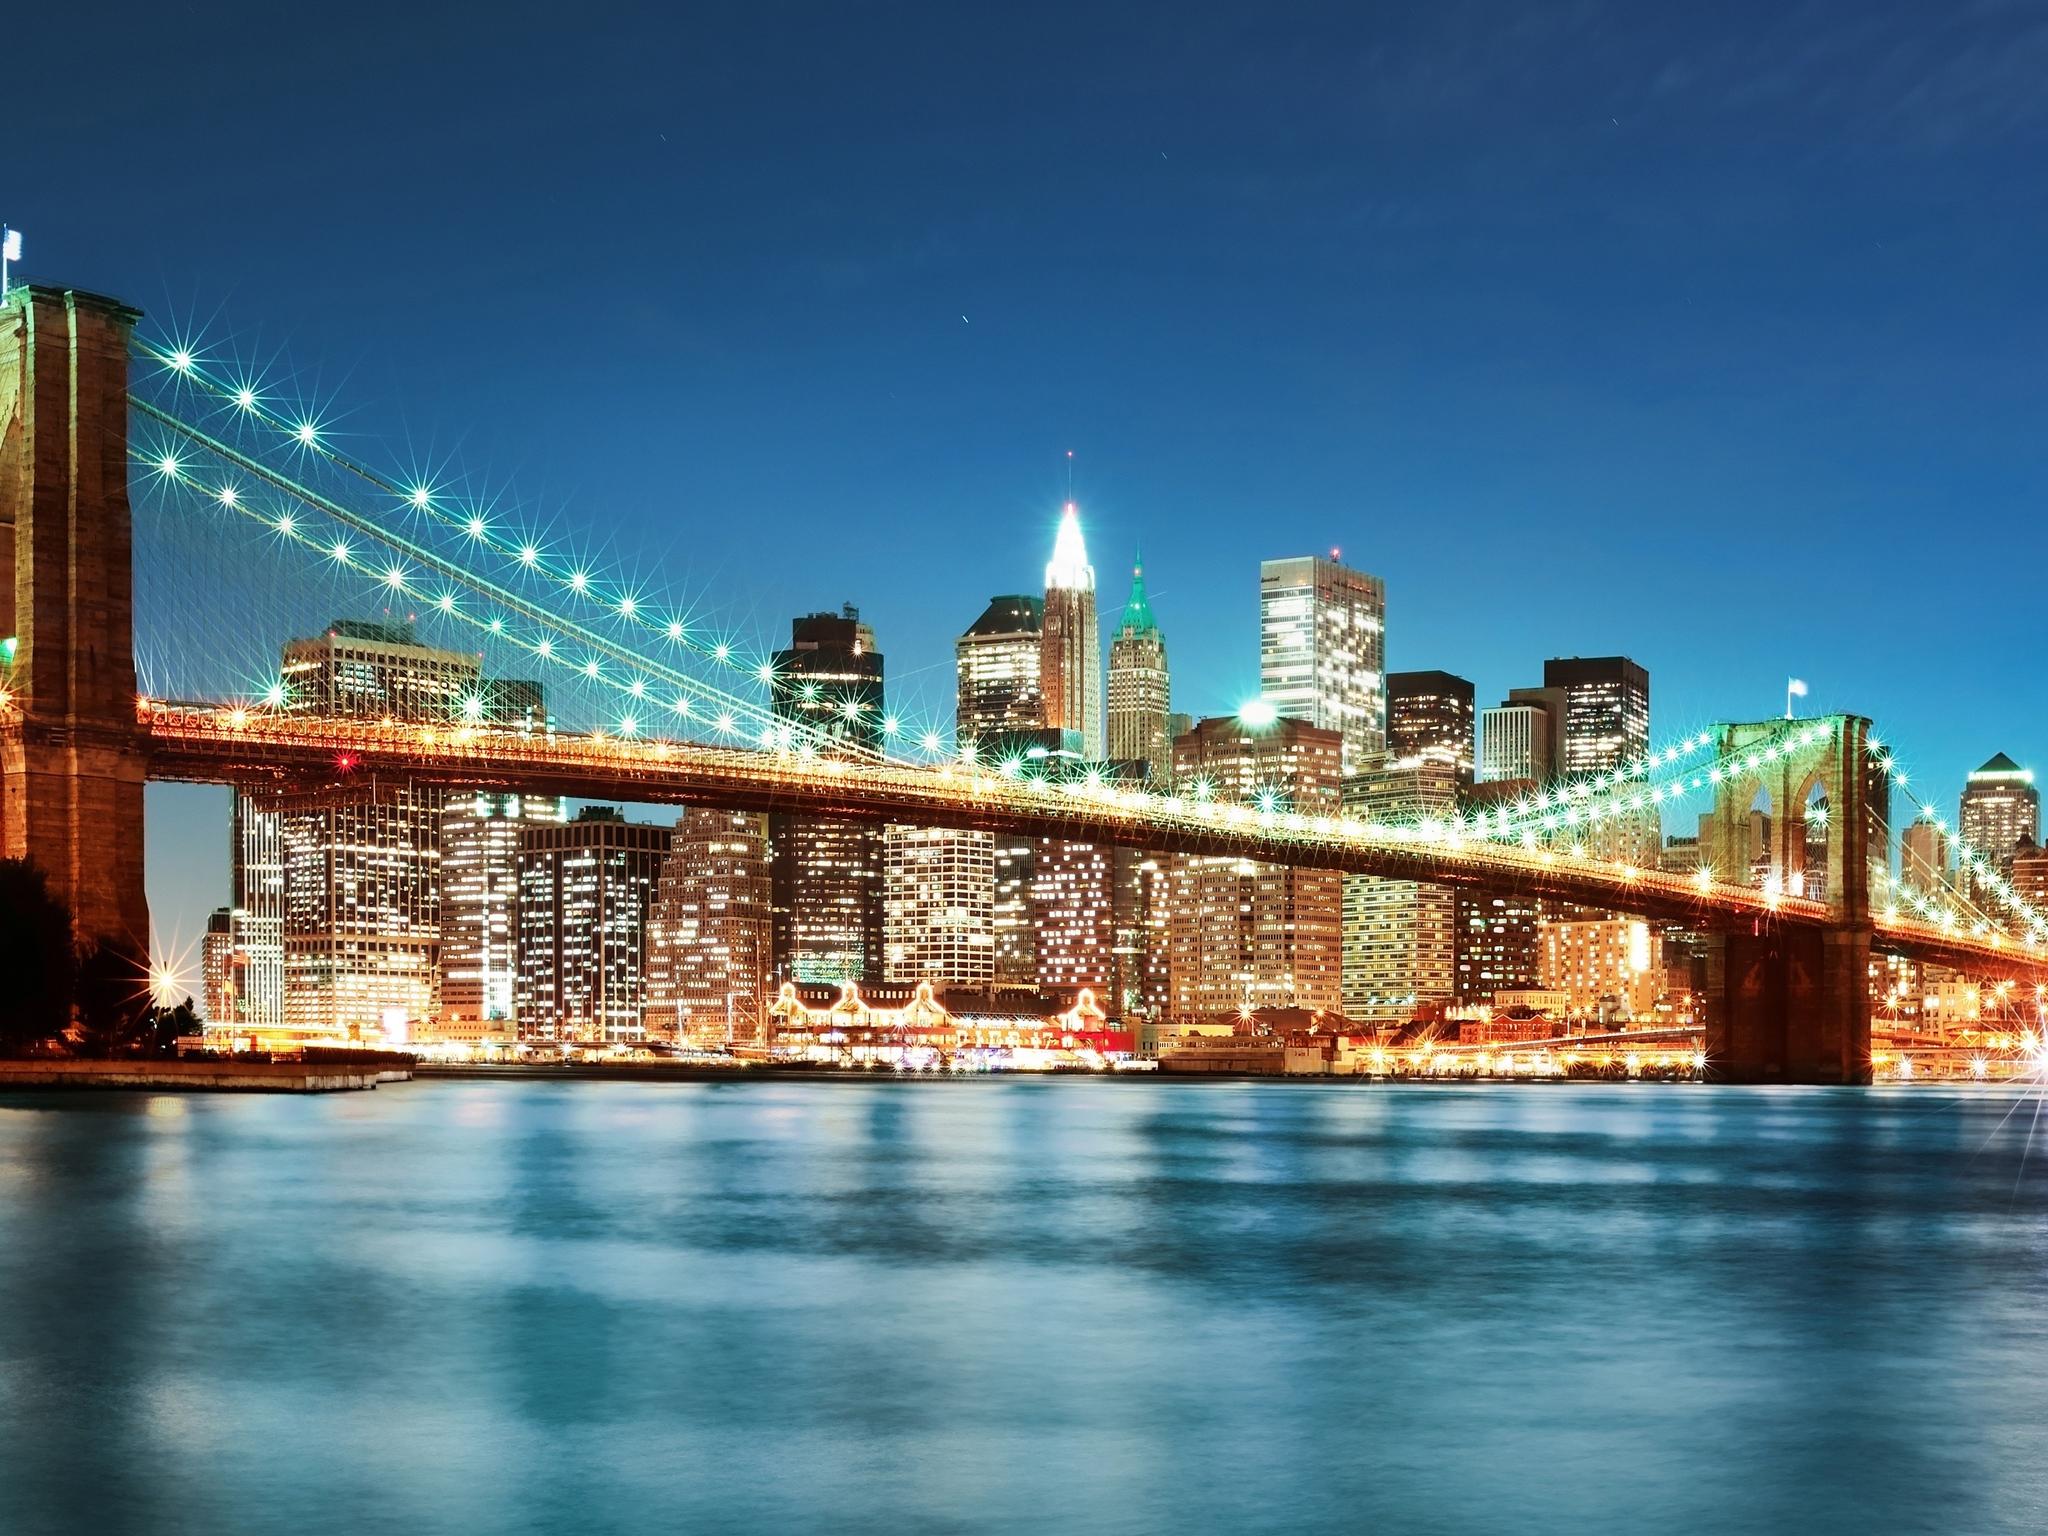 New York City Lights 4K Ultra HD wallpaper 4k WallpaperNet 2048x1536